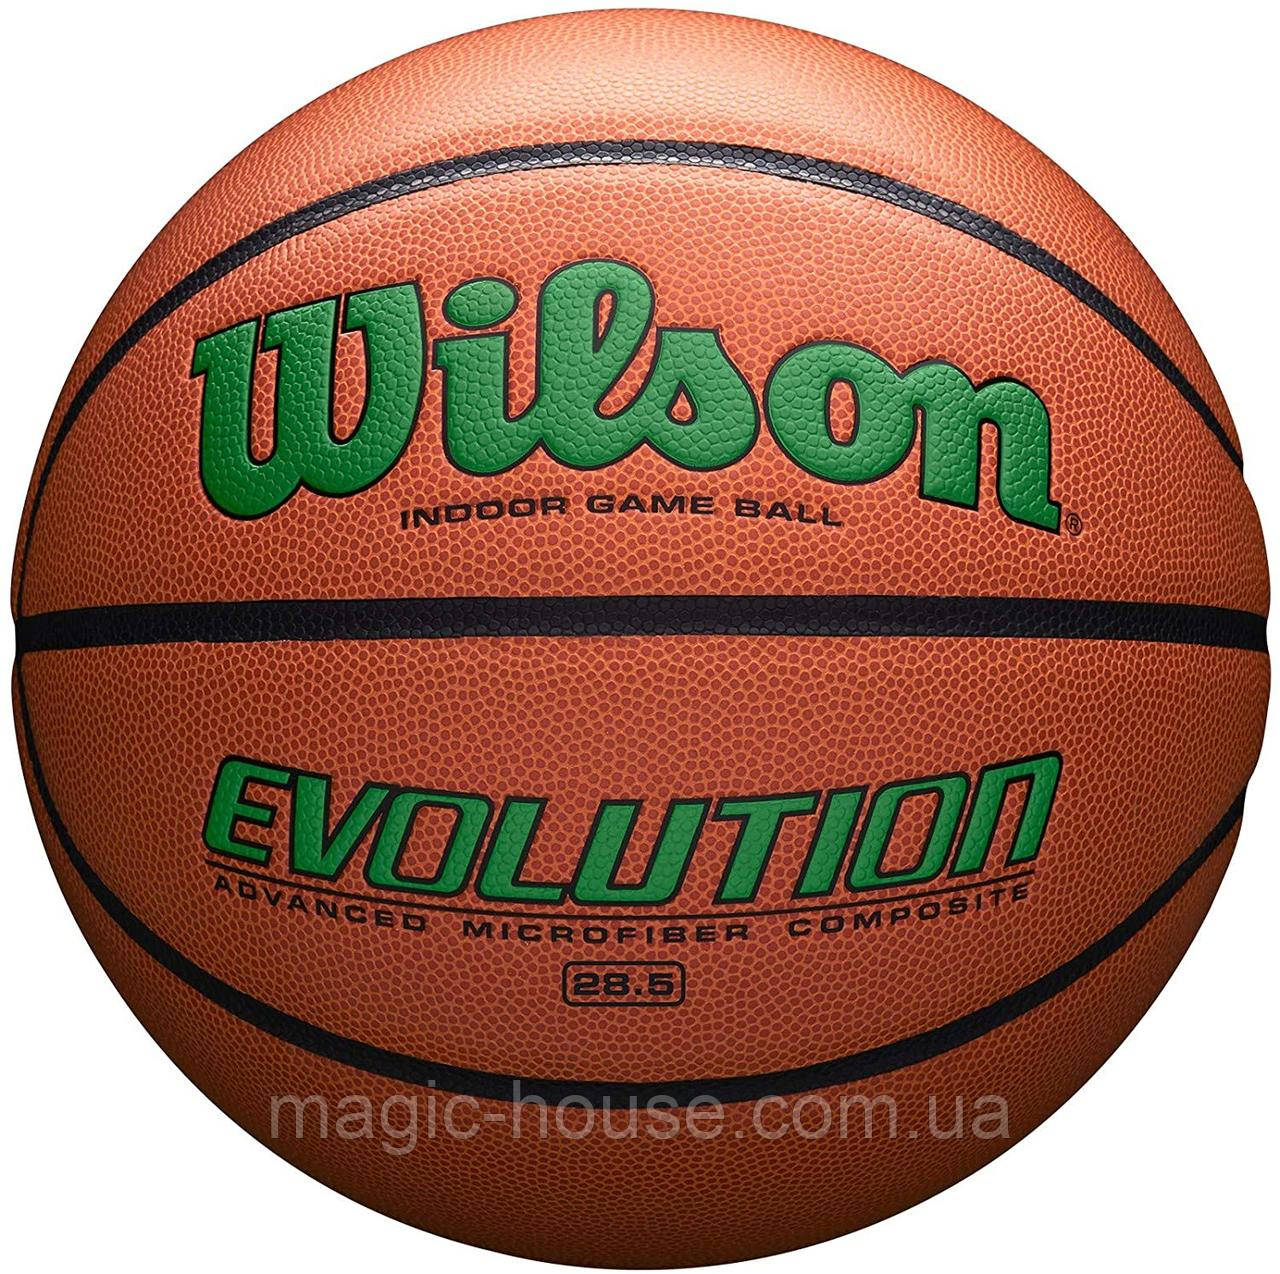 М'яч баскетбольний WILSON Evolution Basketball Game оригінал Size 6, 28.5 композитна шкіра